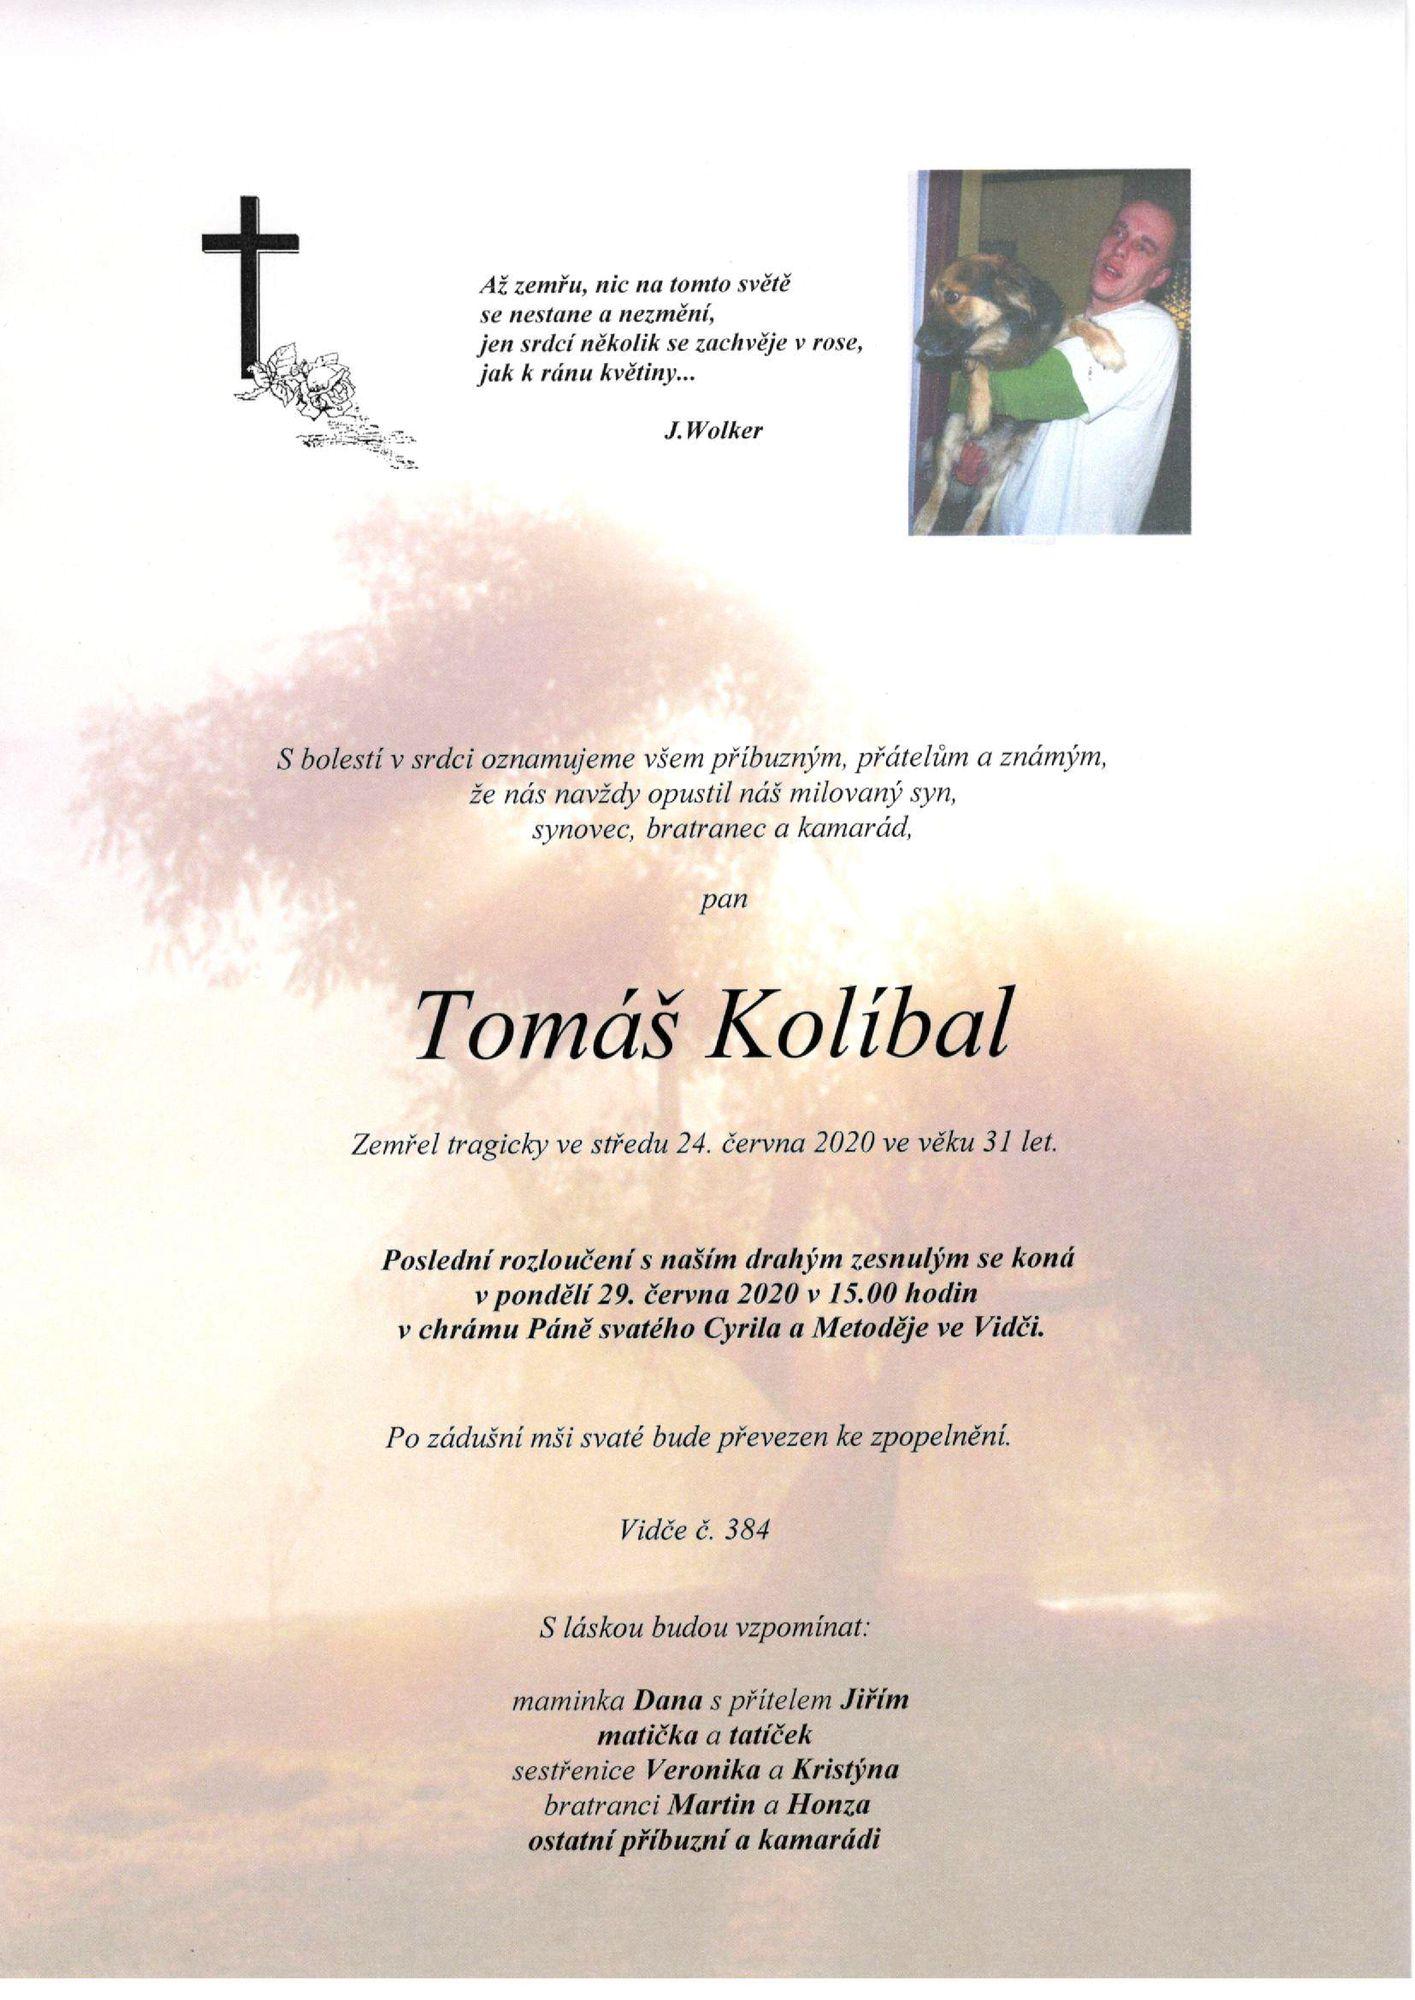 Tomáš Kolíbal